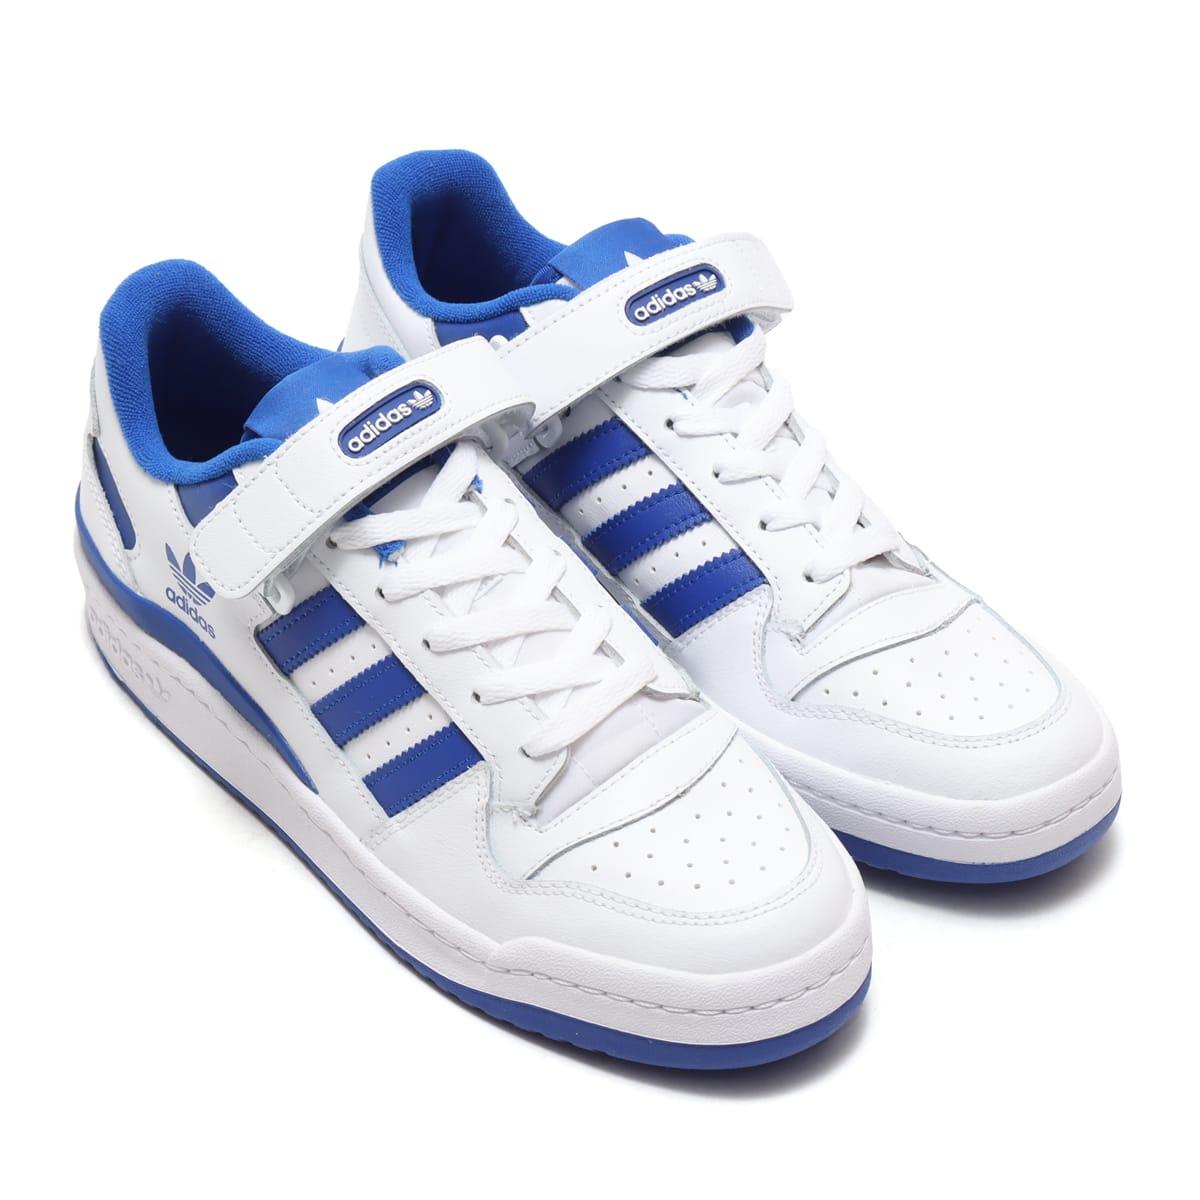 adidas FORUM LOW FOOTWEAR WHITE/FOOTWEAR WHITE/TEAM ROYAL BLUE 21SS-I_photo_large